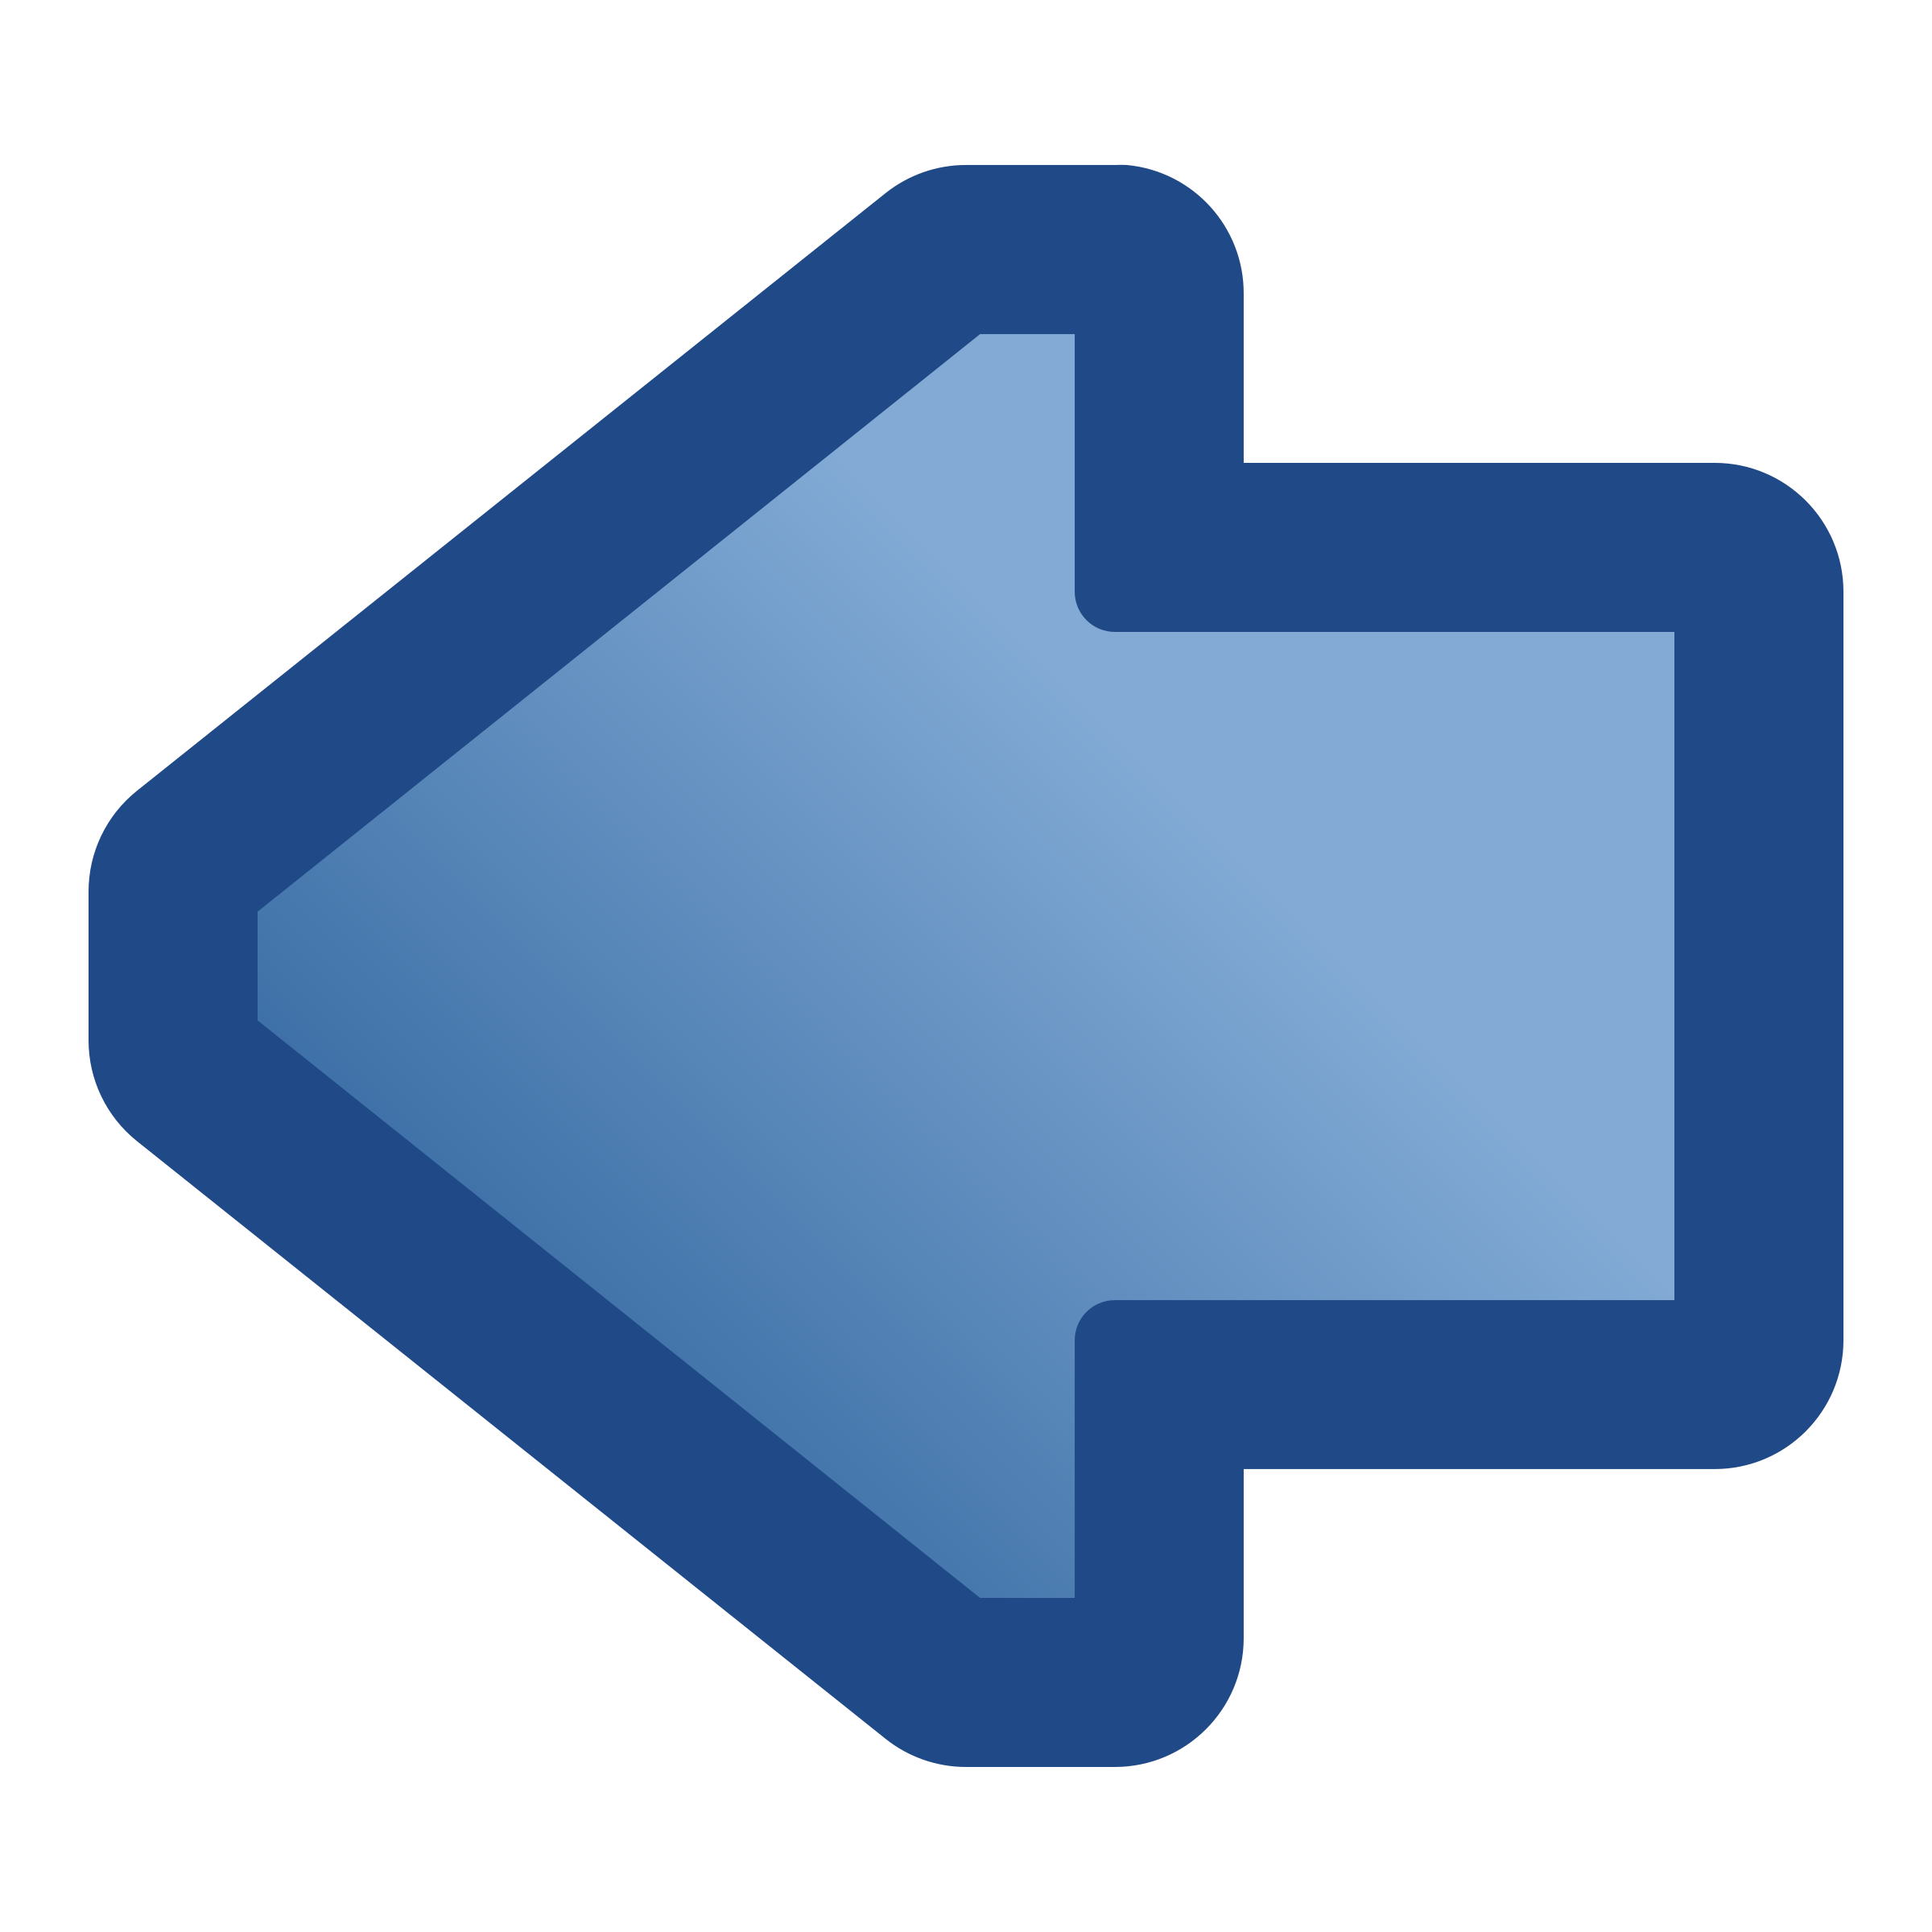 Arrow mustache heart clipart transparent download Clipart - icon-arrow-left-blue transparent download